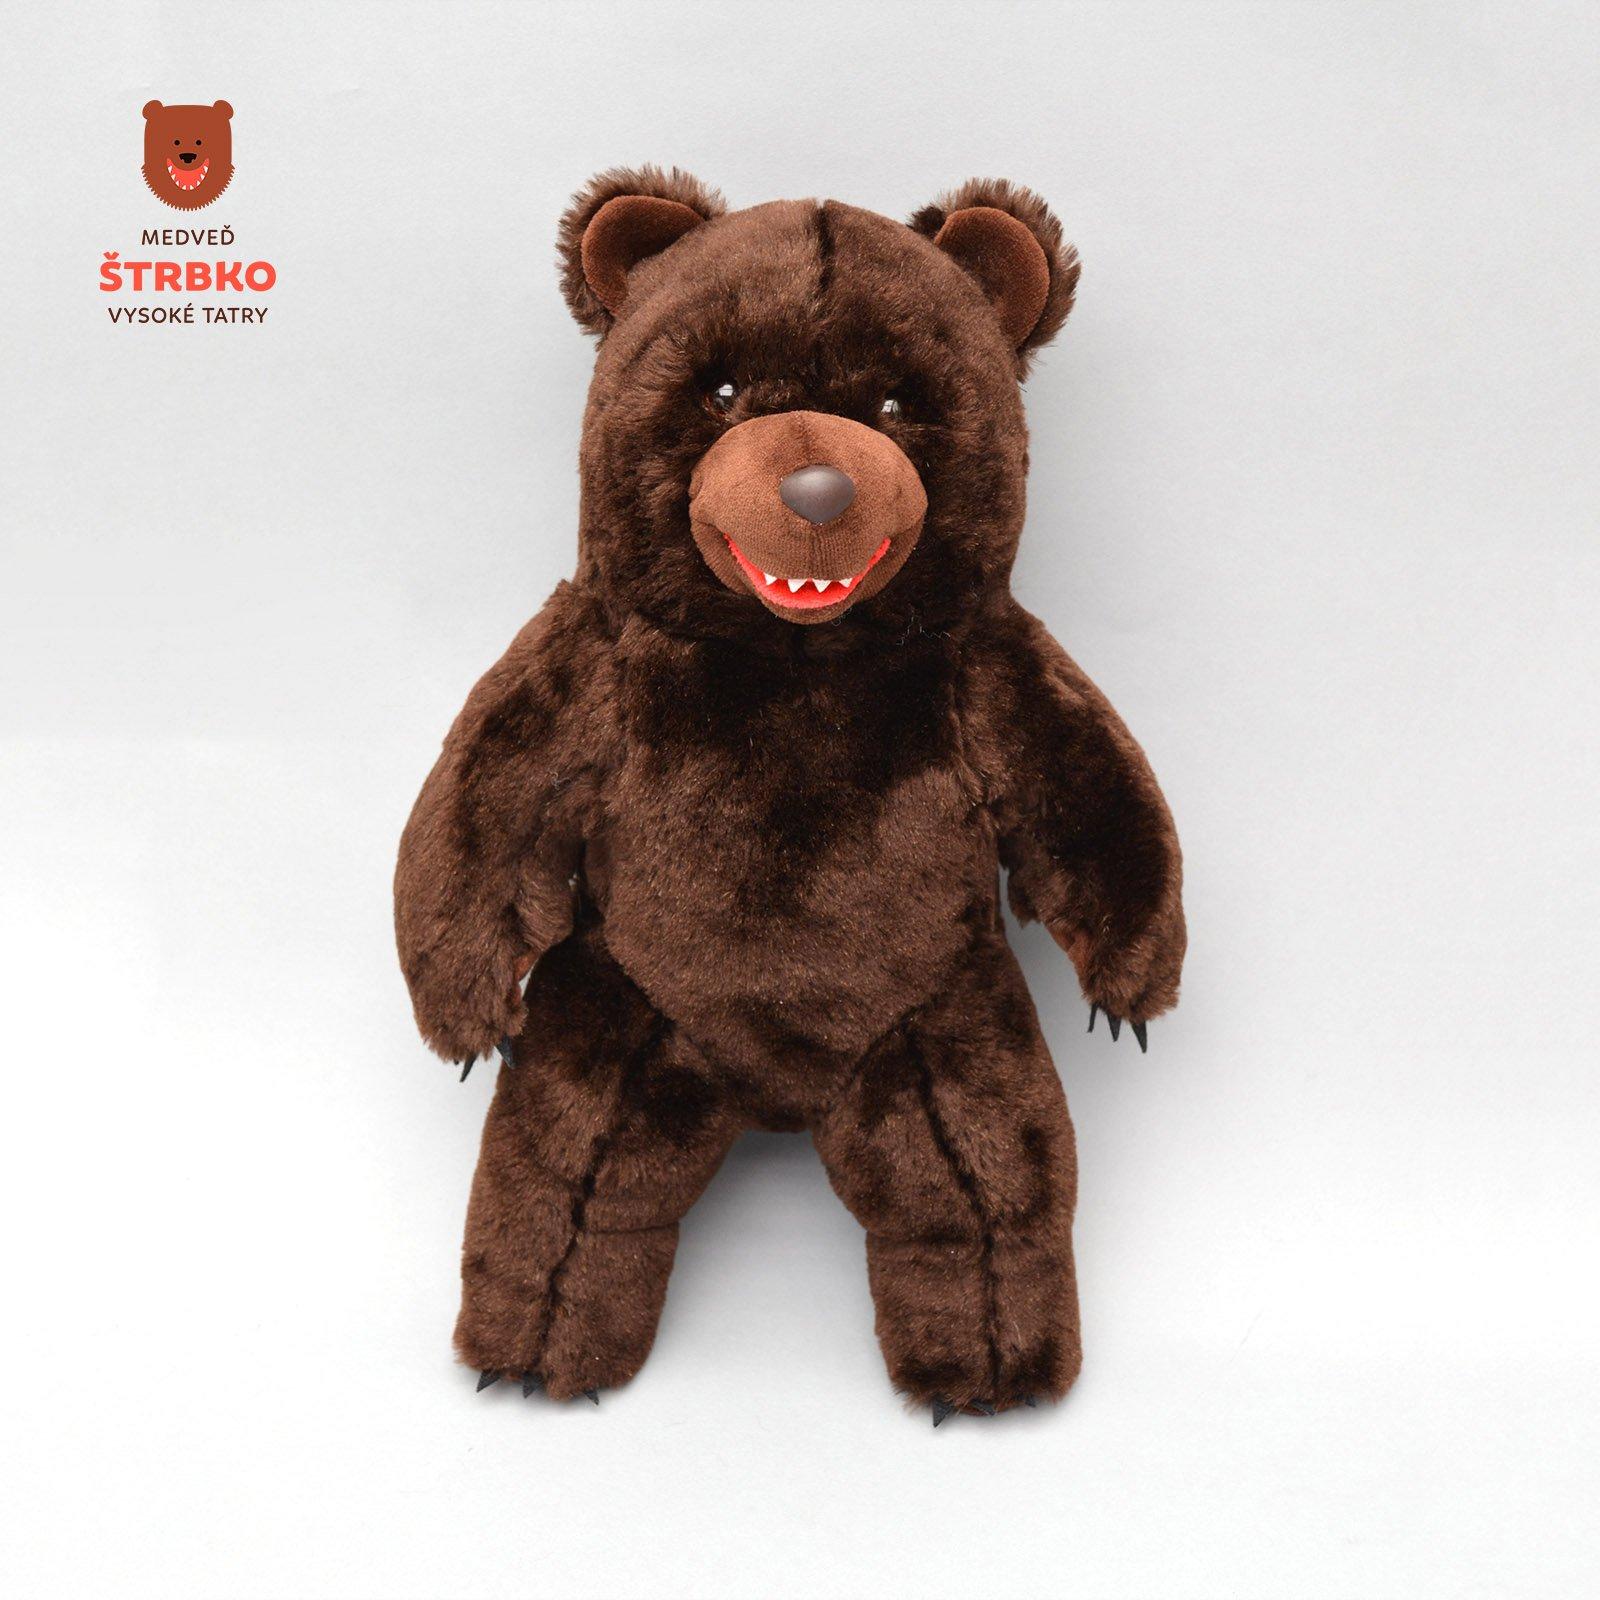 ŠTRBKO the Bear